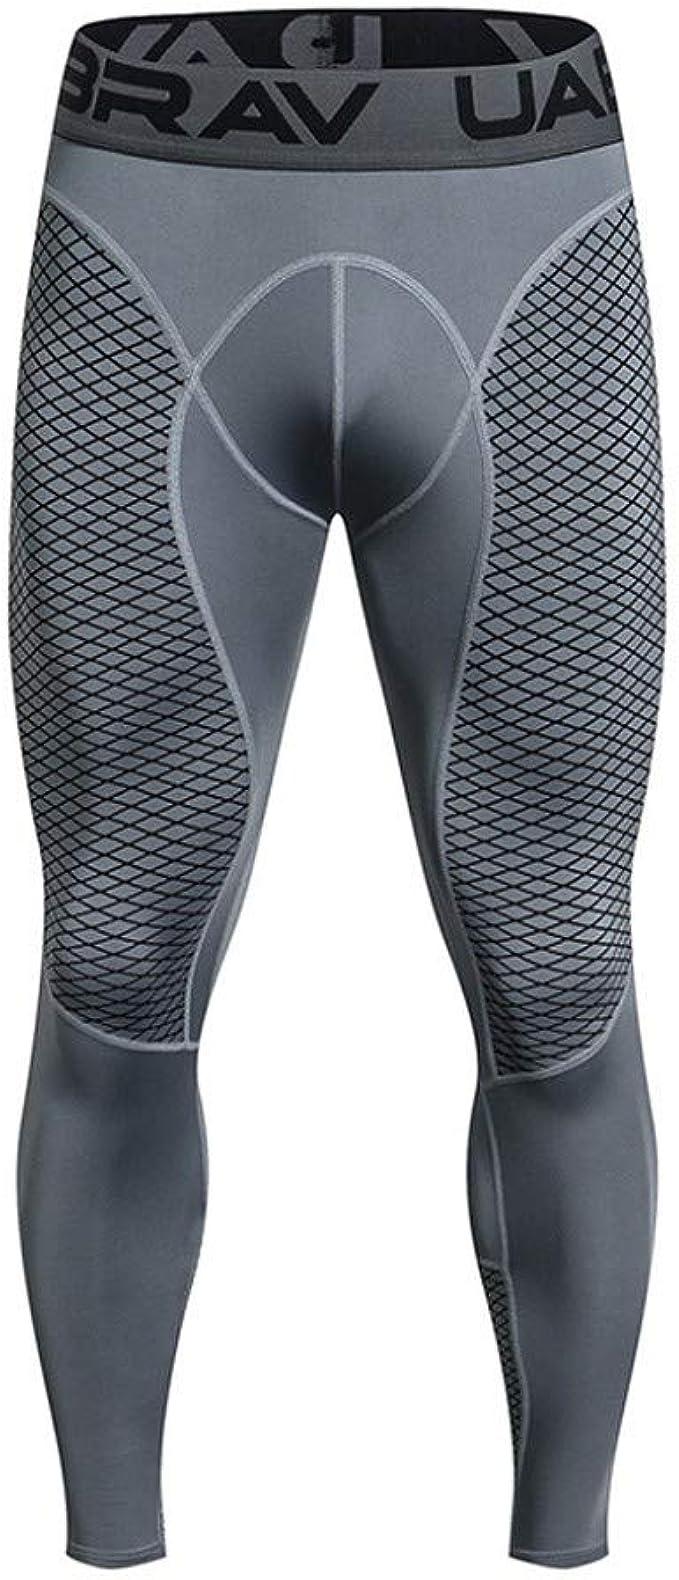 YiZYiF M/ädchen Sport Shorts Kurz Hose Stretch Leggings Sporthose Trainingshose Turnhose Panties Hipster Freizeithose Gymnastik Fitness Tanz Yoga